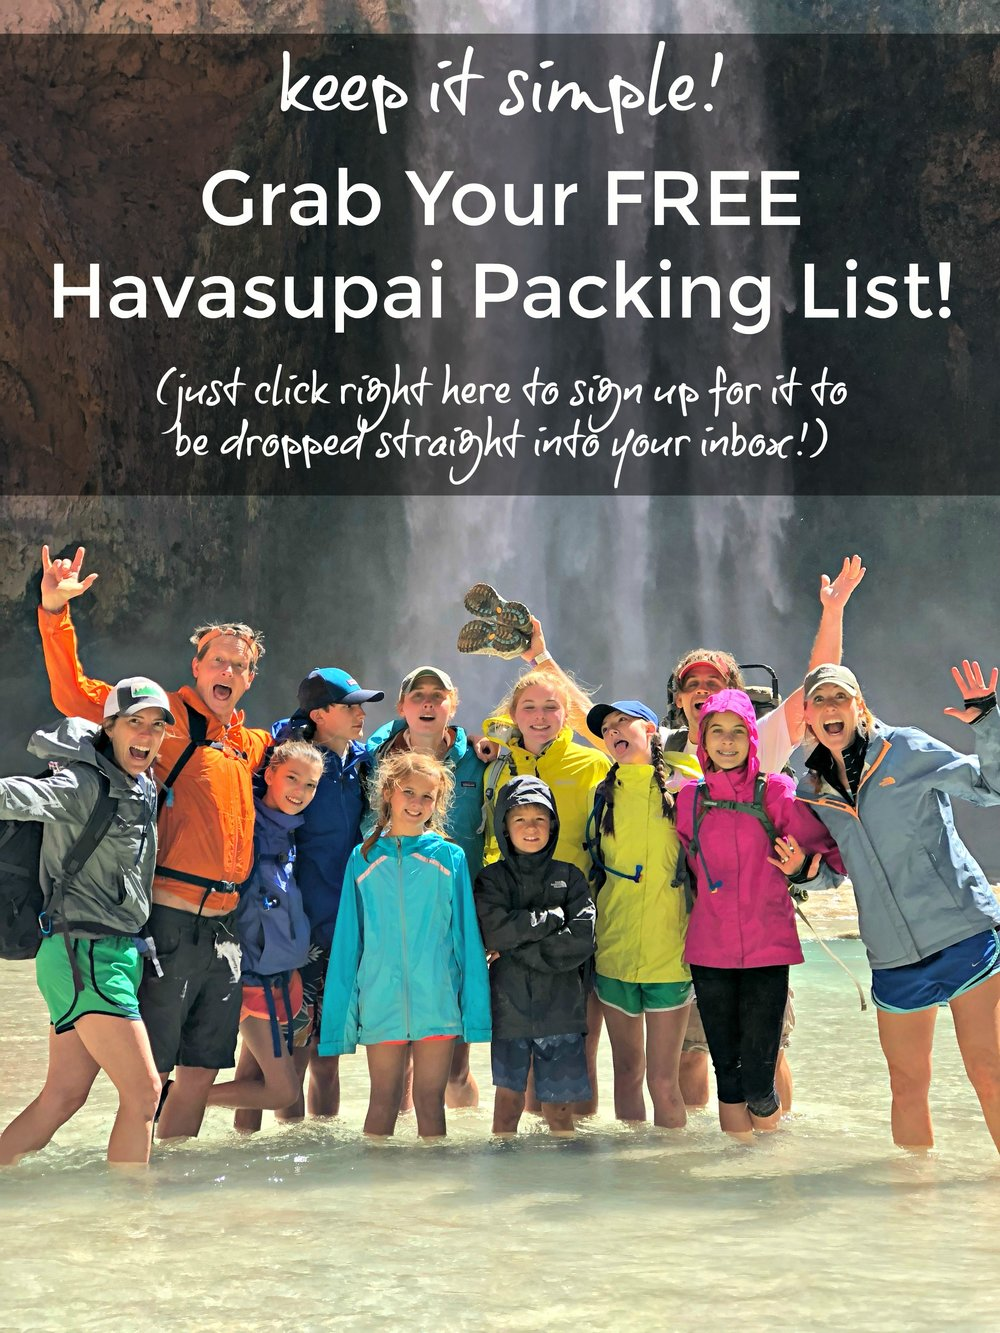 Free Havasupai packing list click.jpg